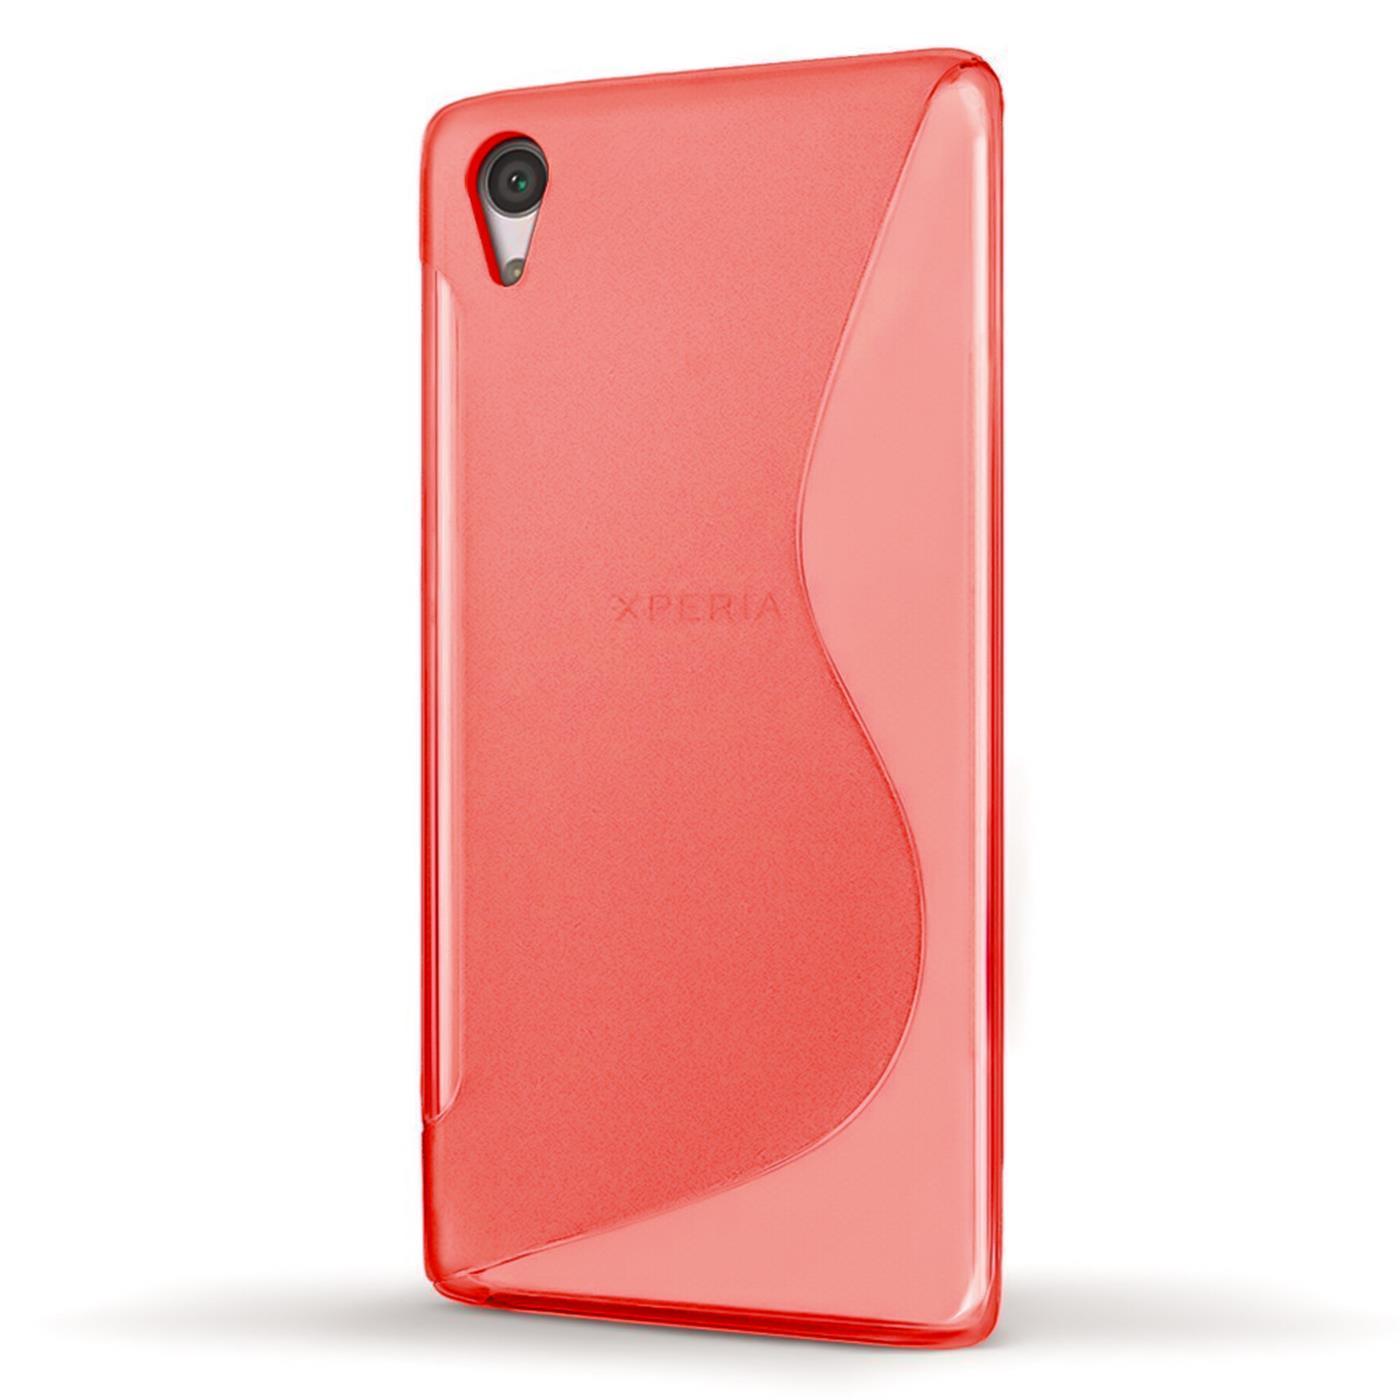 Sony-Xperia-X-Silikon-Gel-S-Line-Case-Cover-Ultra-Thin-Slim-Back-Bumper Indexbild 16